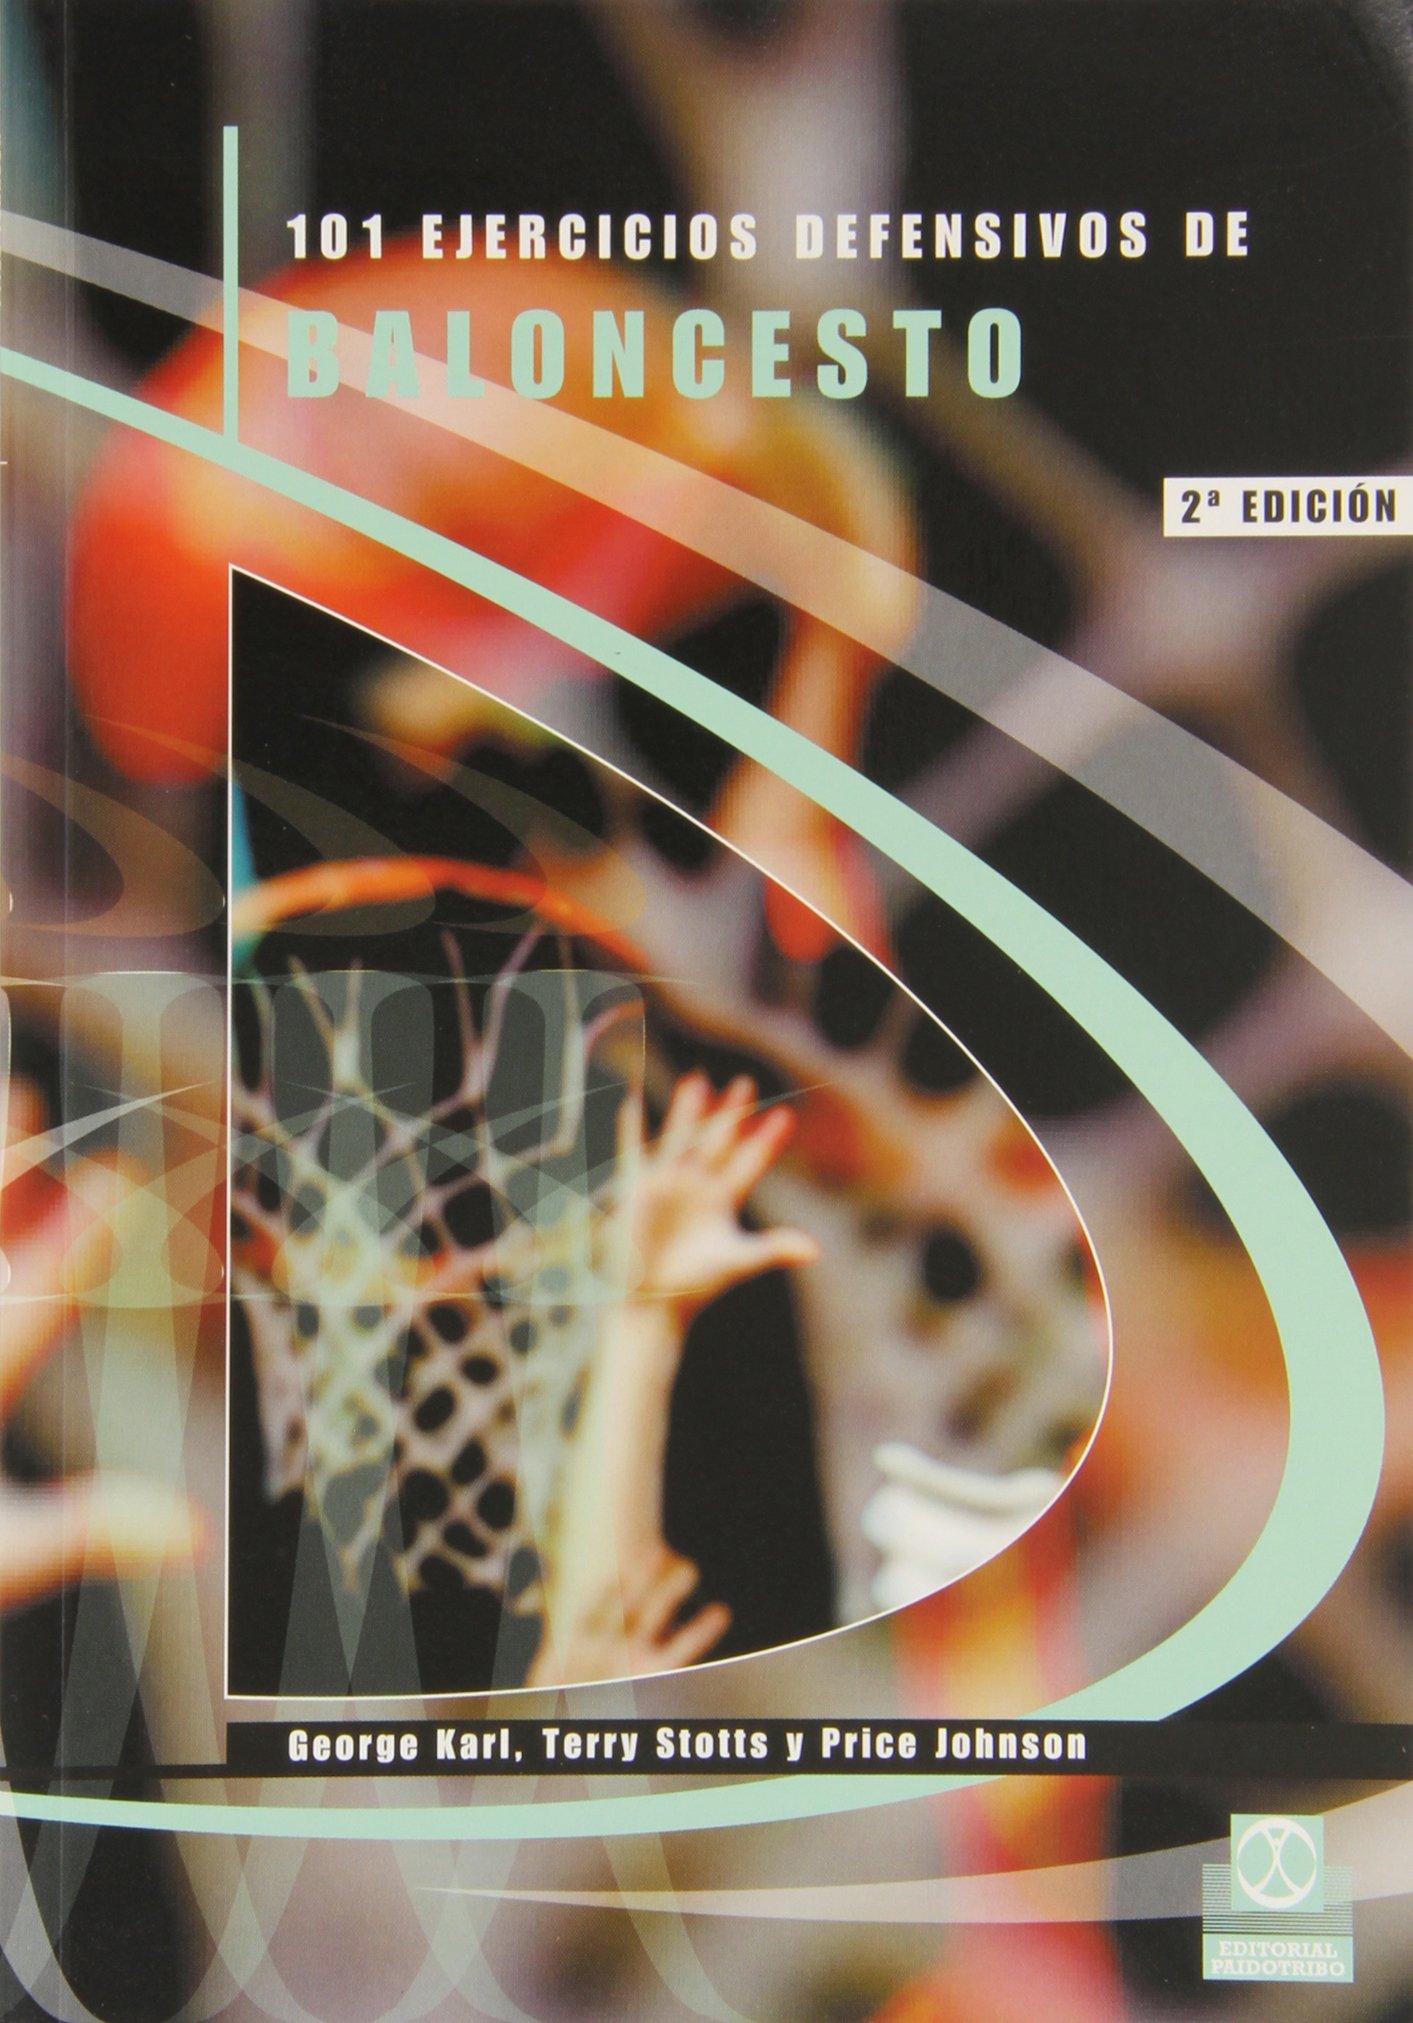 101 Ejercicios Defensivos de Baloncesto (Deportes) Tapa blanda – 16 feb 2015 George Karl Terry Stotts Price Johnson Paidotribo